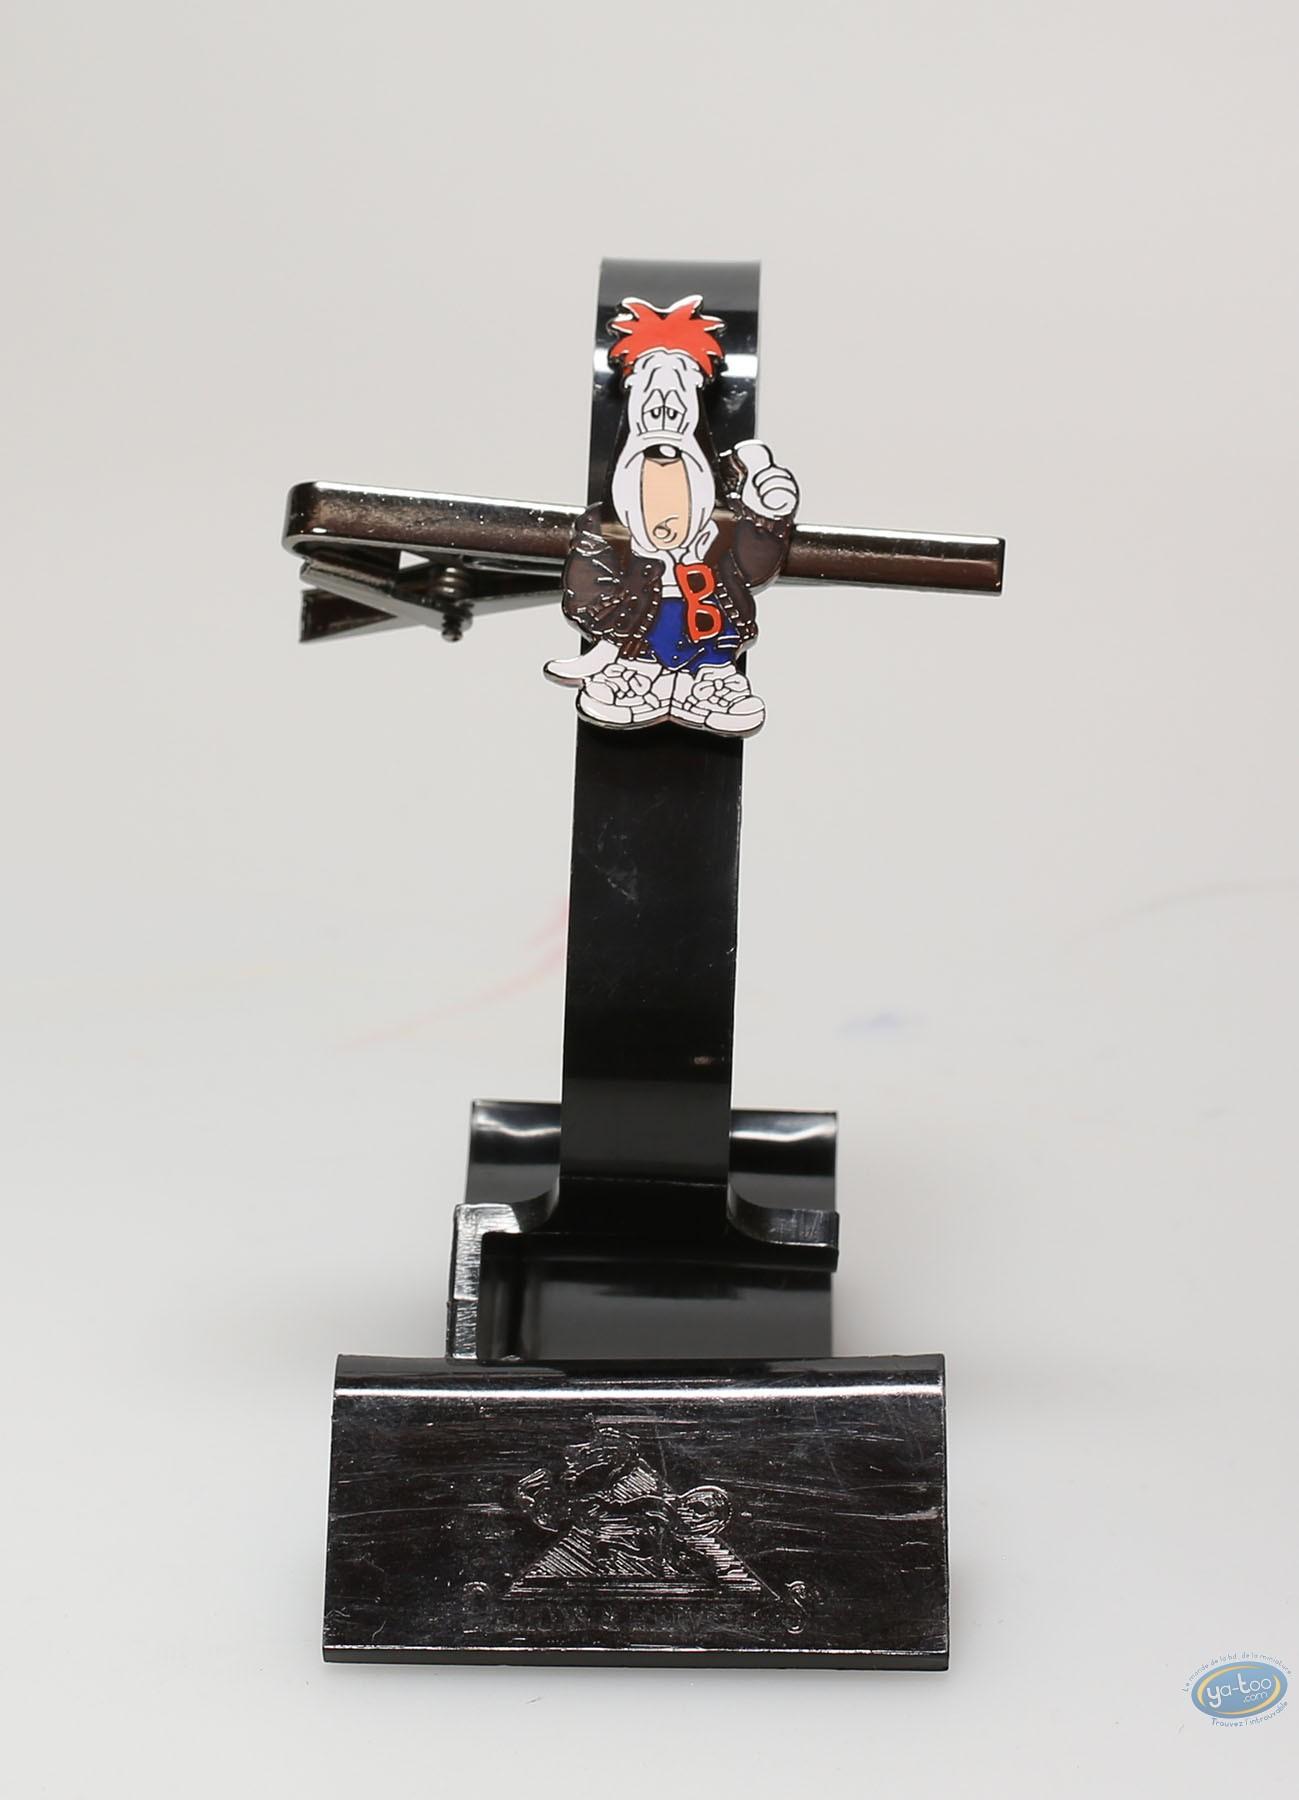 Vêtement, Tex Avery : Pince à cravate - Droopy